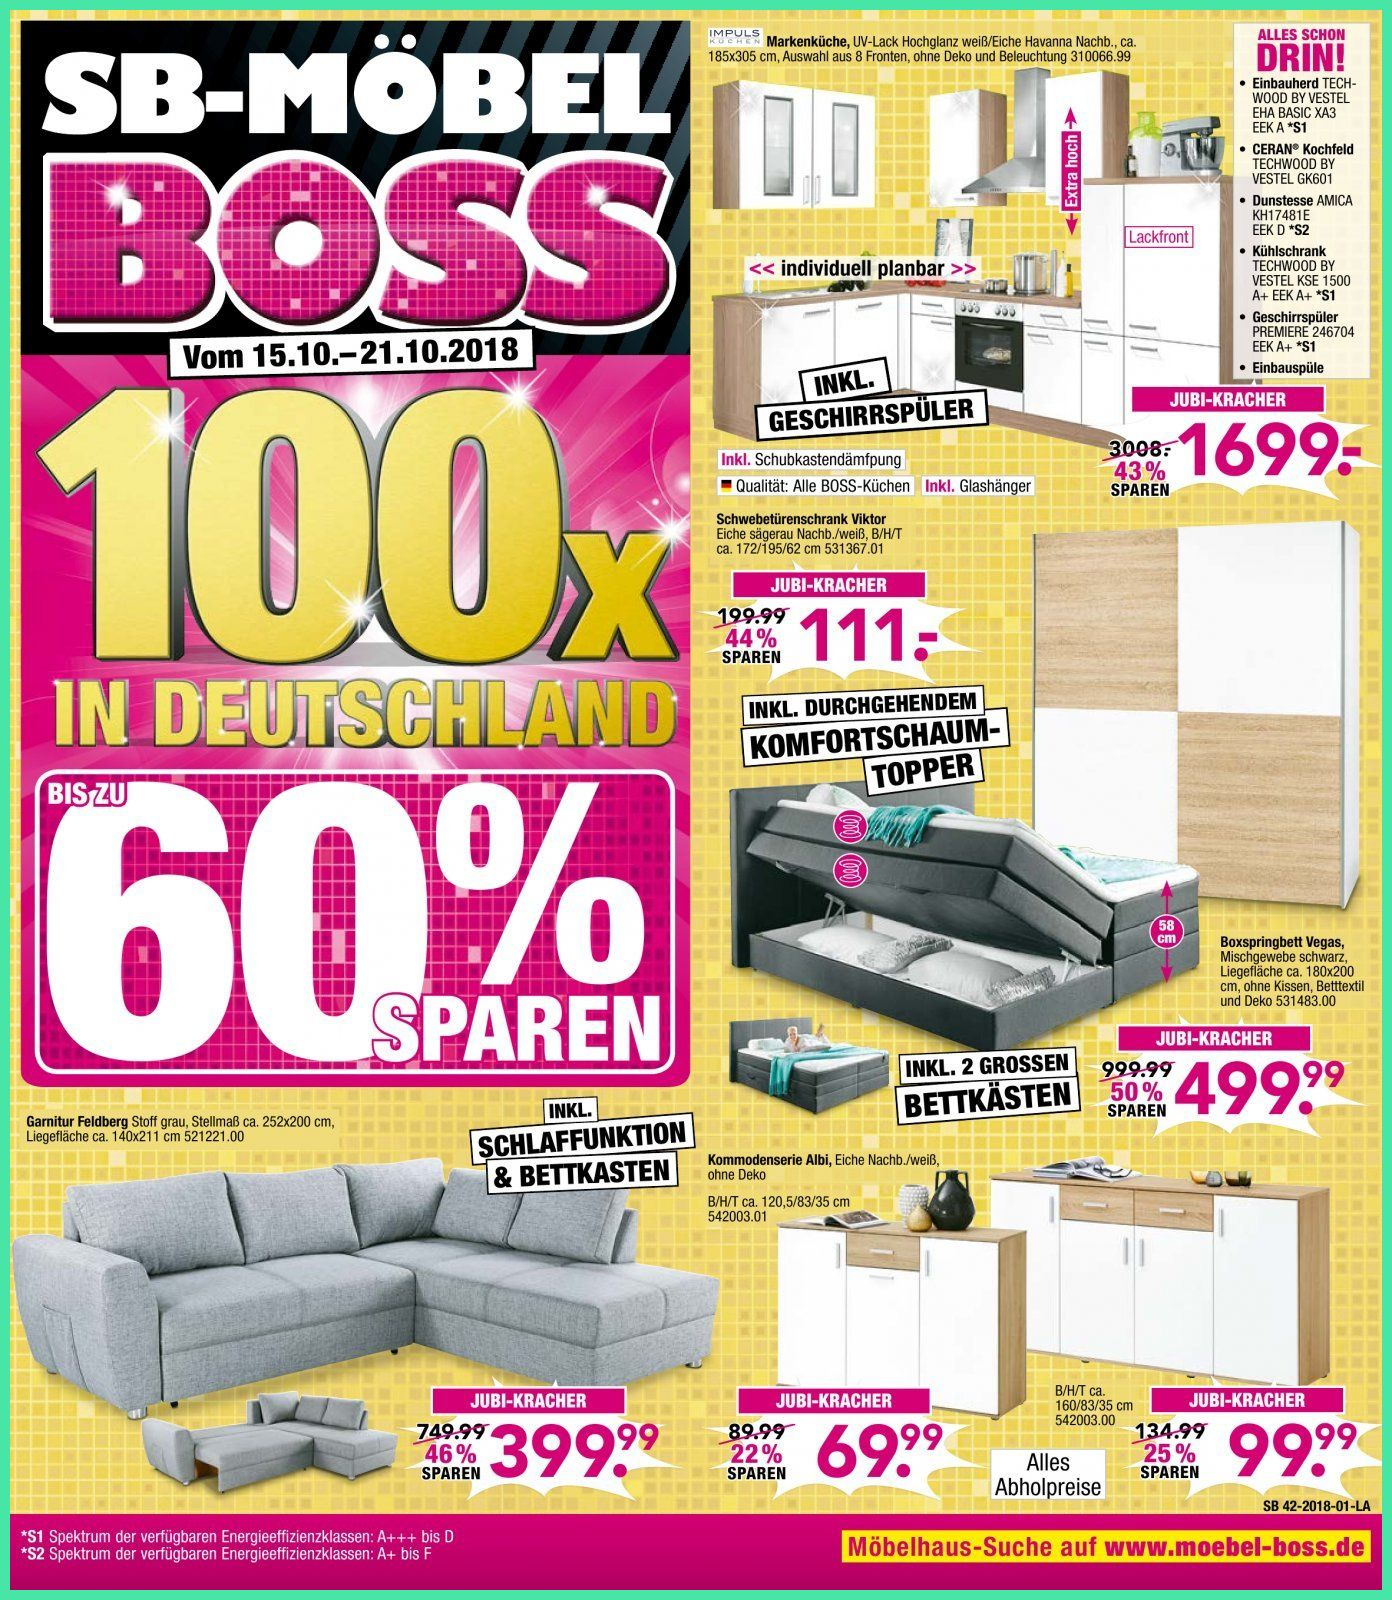 18 Magnificent Möbel Boss Angebote Sofa Home Decor Decor Home